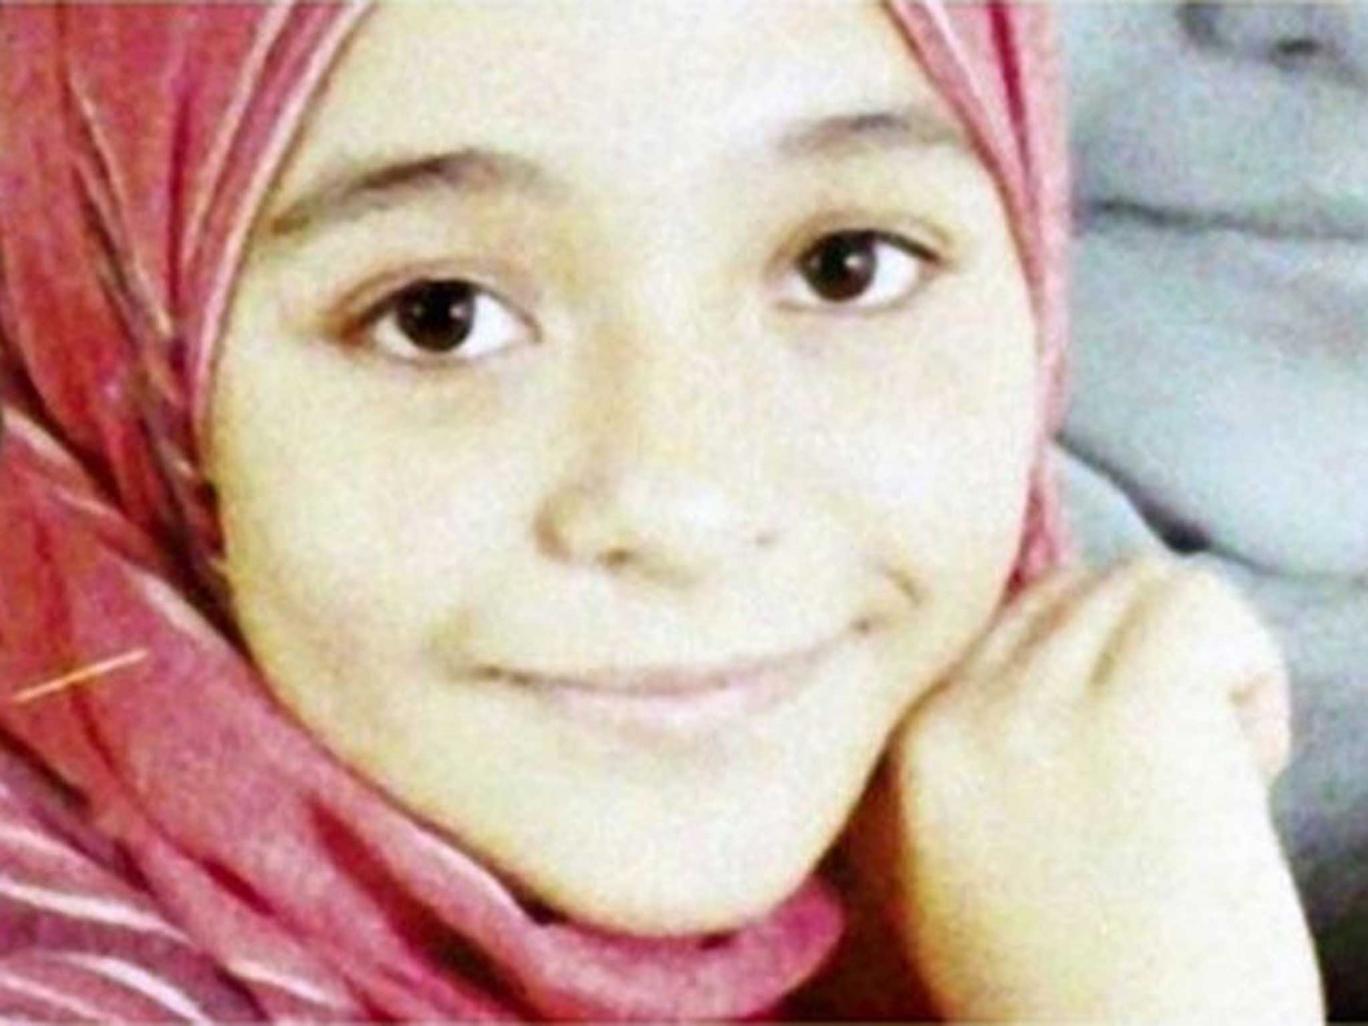 Lost girl: Suhair al-Bata'a, who died aged 13